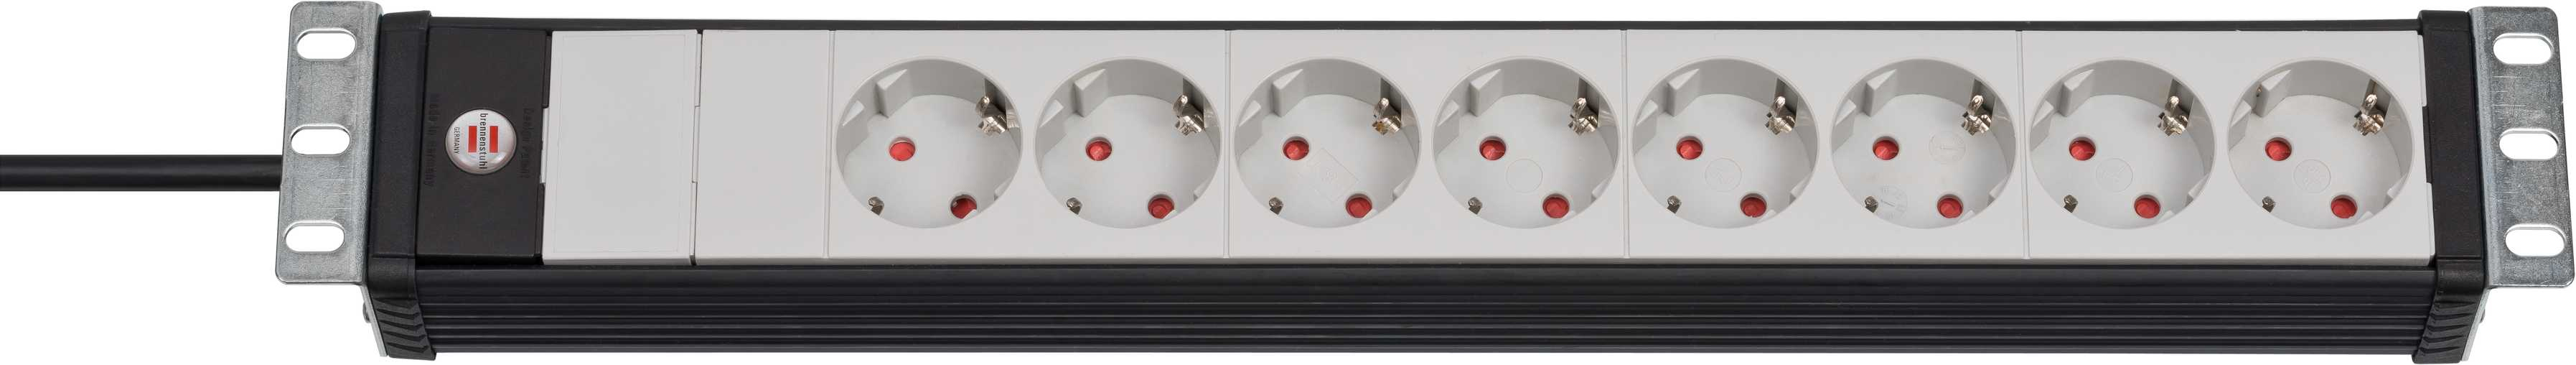 Brennenstuhl 1156057028 - 3 m - Schwarz - Grau - 105 mm - 65 mm - 485 mm - 840 g